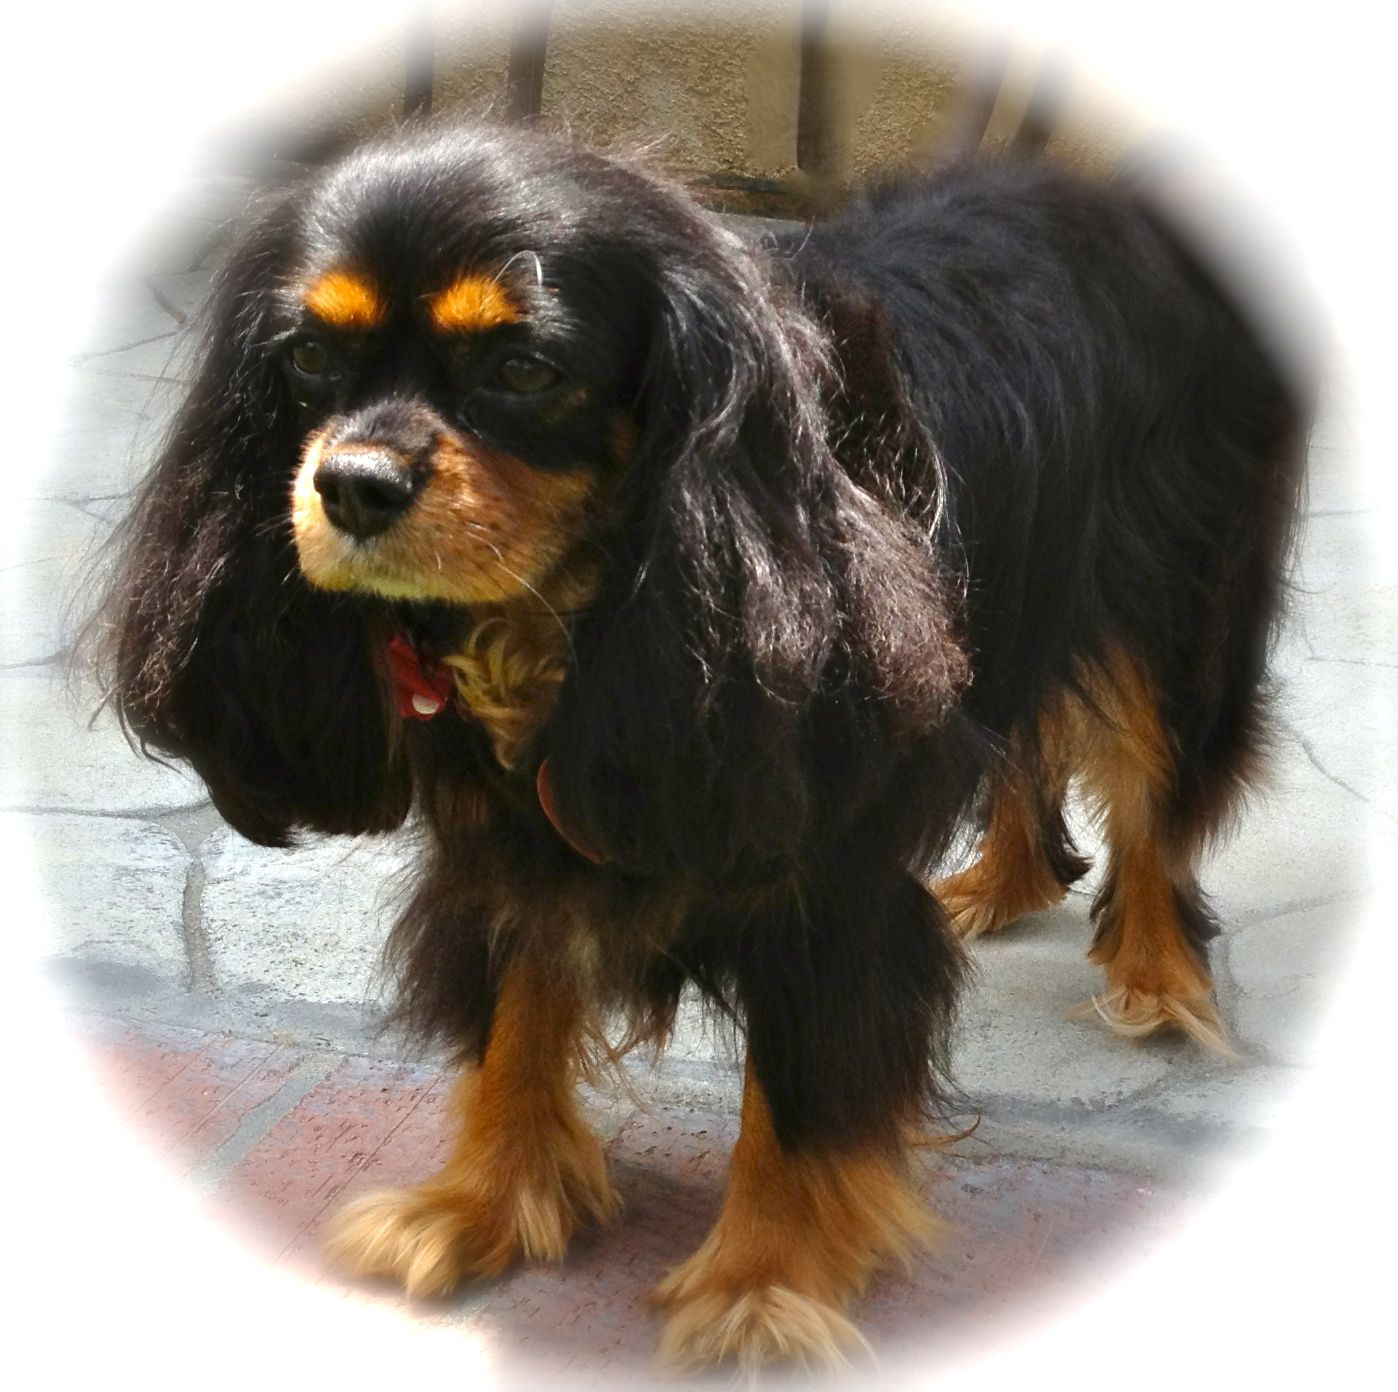 Tiny Bella our 10 pound Cavalier King Charles Spaniel